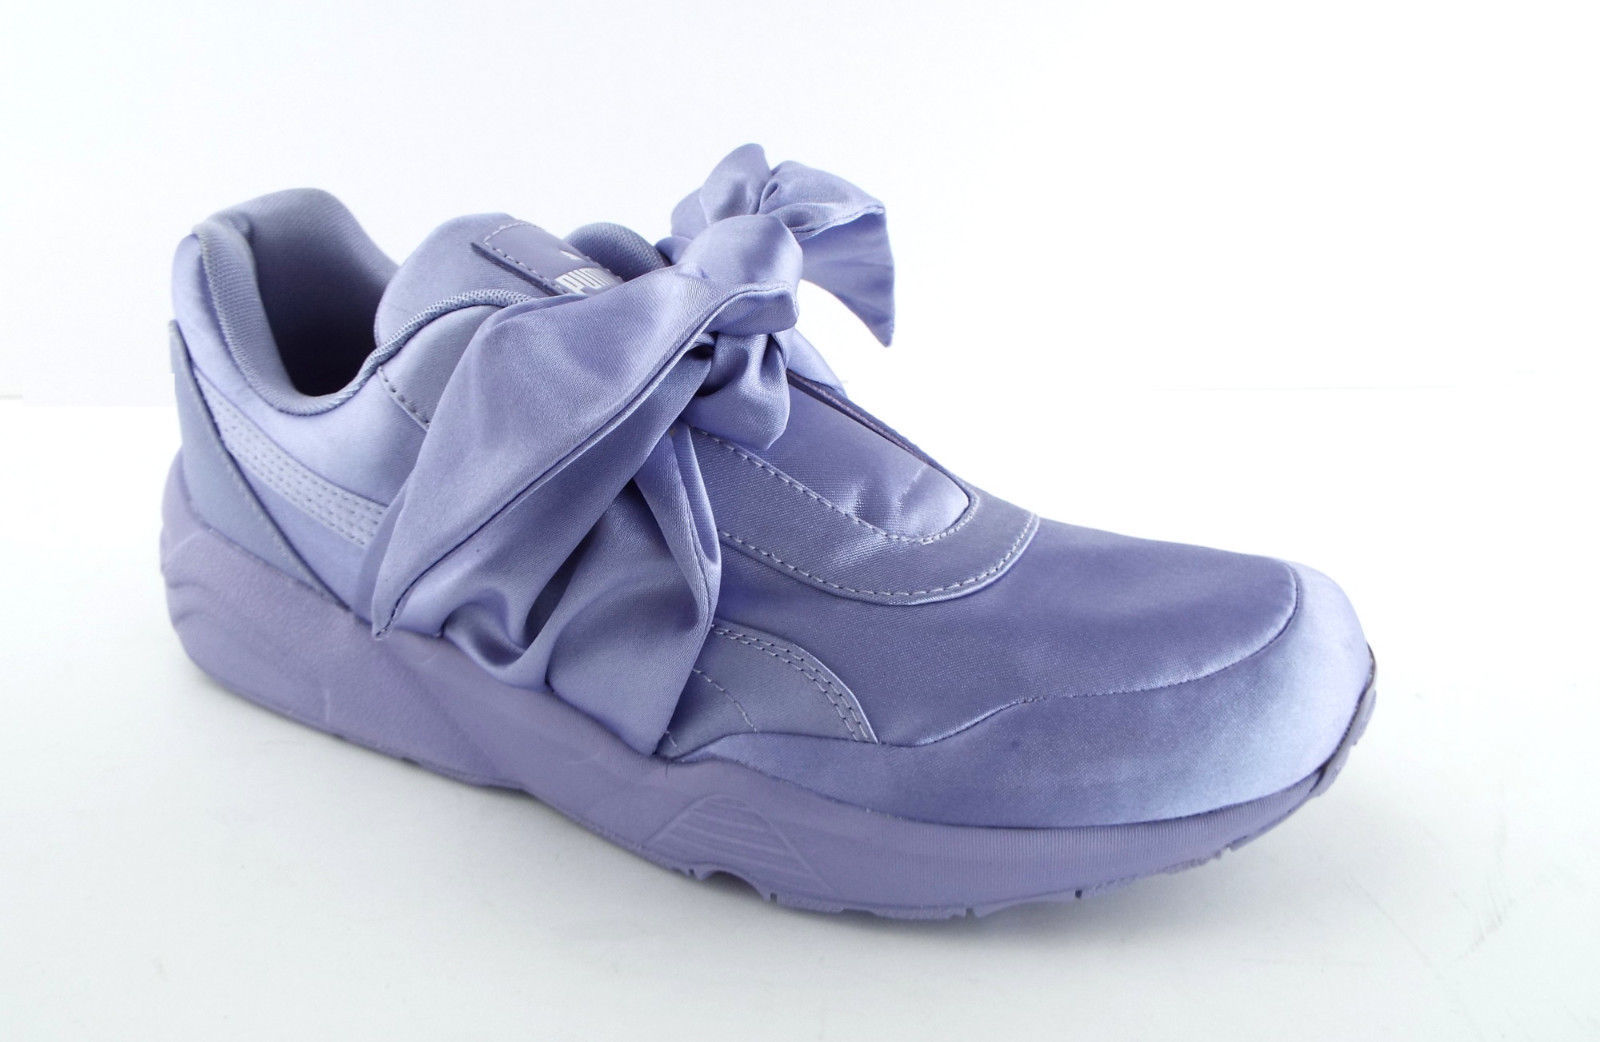 New PUMA RIHANNA Size 9 FENTY Purple Satin Bow Sneakers Shoes image 3